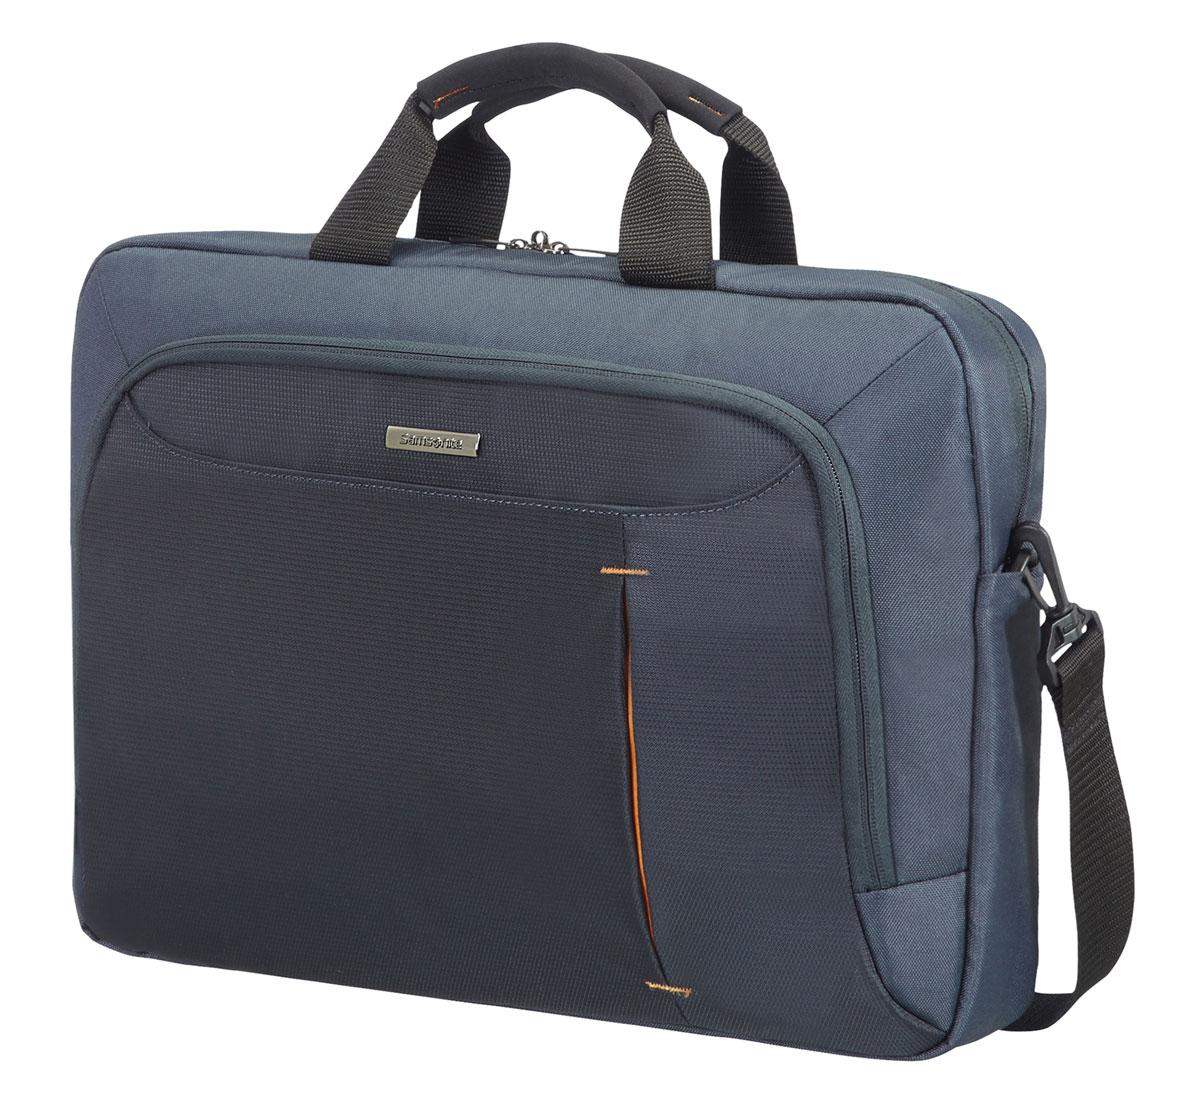 Сумка для ноутбука Samsonite GuardIt, цвет: серый, 43,5 х 30,5 х 11,5 samsonite samsonite плече сумка рюкзак apple macbook air pro компьютер мешок мужчин и женщин ноутбук сумка 13 3 дюймов bp2 28002 светло серый